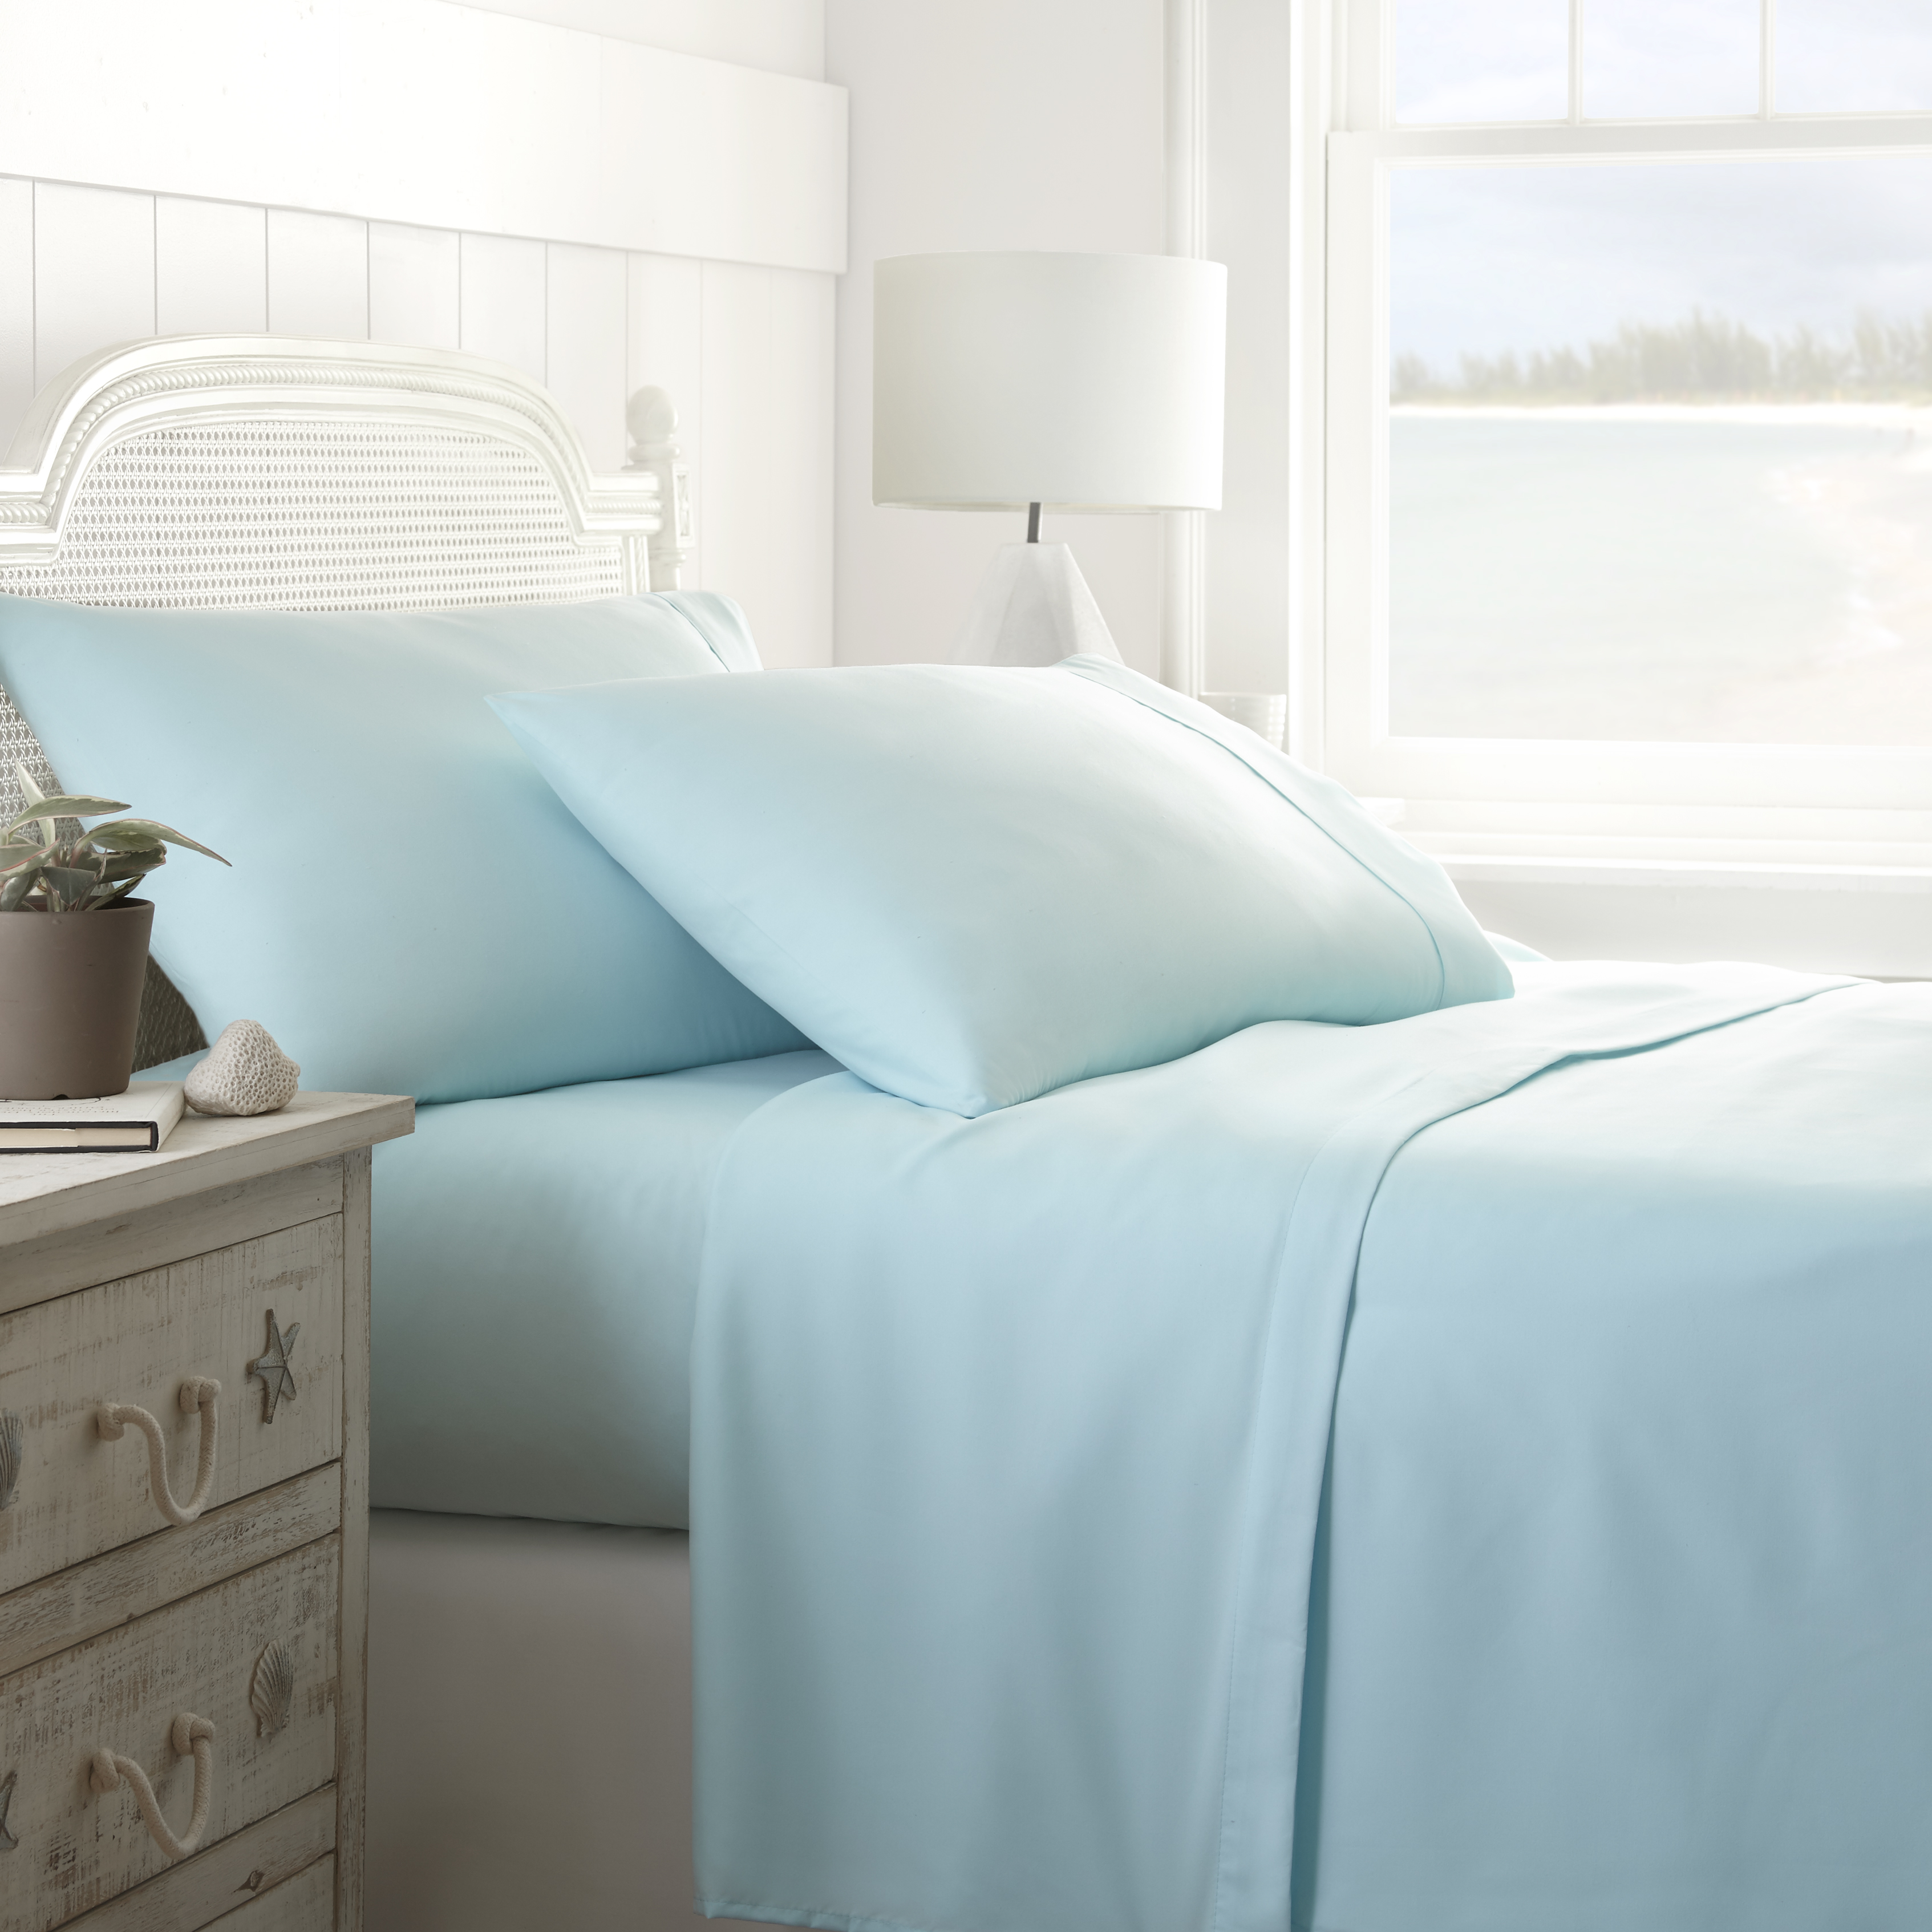 Beautiful Urban Loft Luxury Performance 4 Piece Bed Sheet Set   Tanga